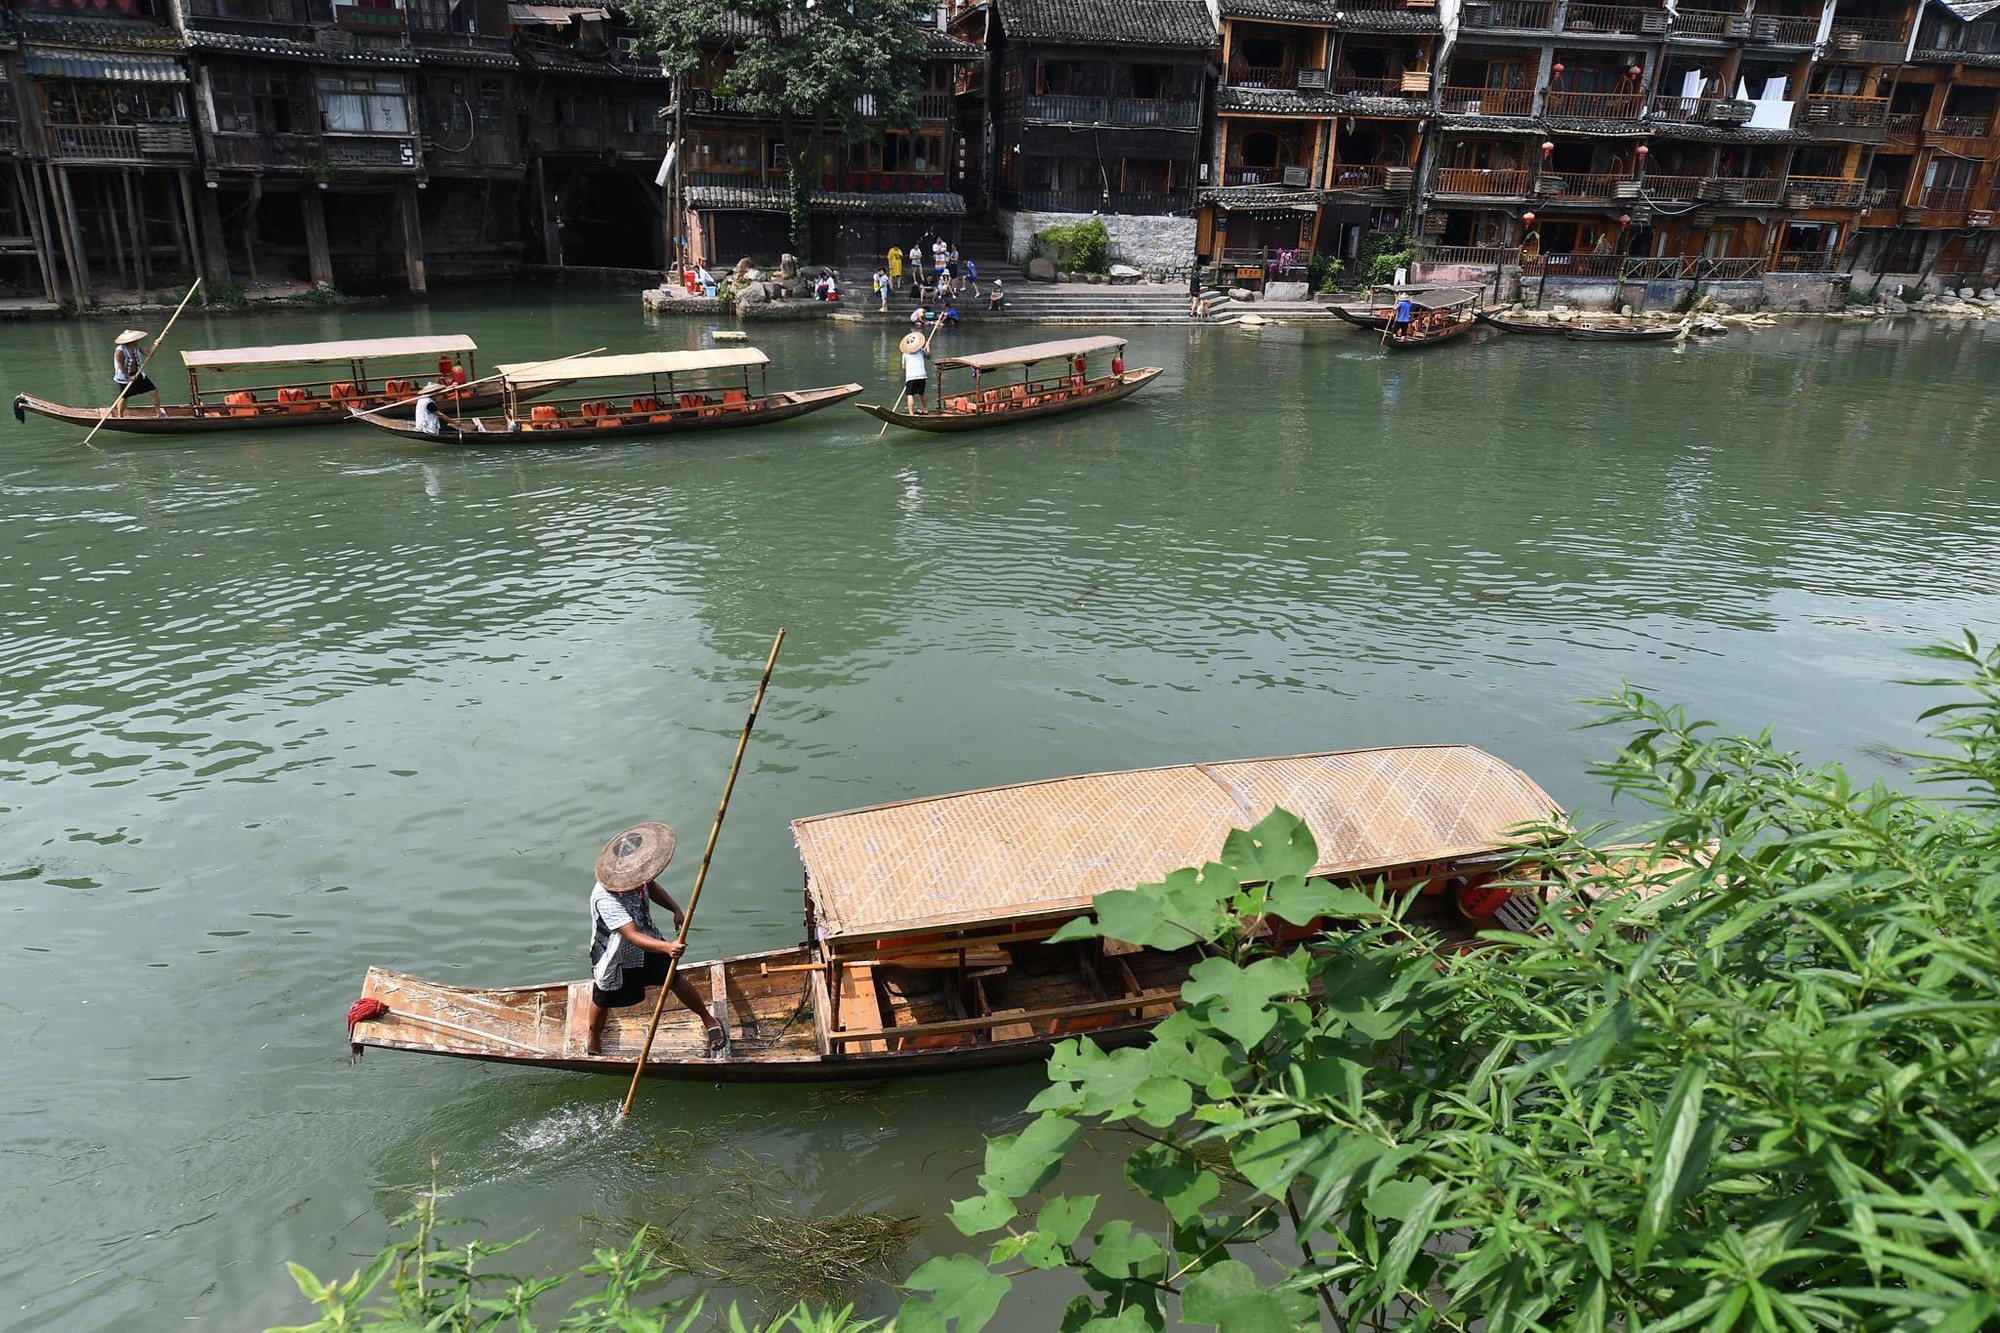 Phuong Hoang co tran va bi mat thu hut khach du lich quanh nam hinh anh 9